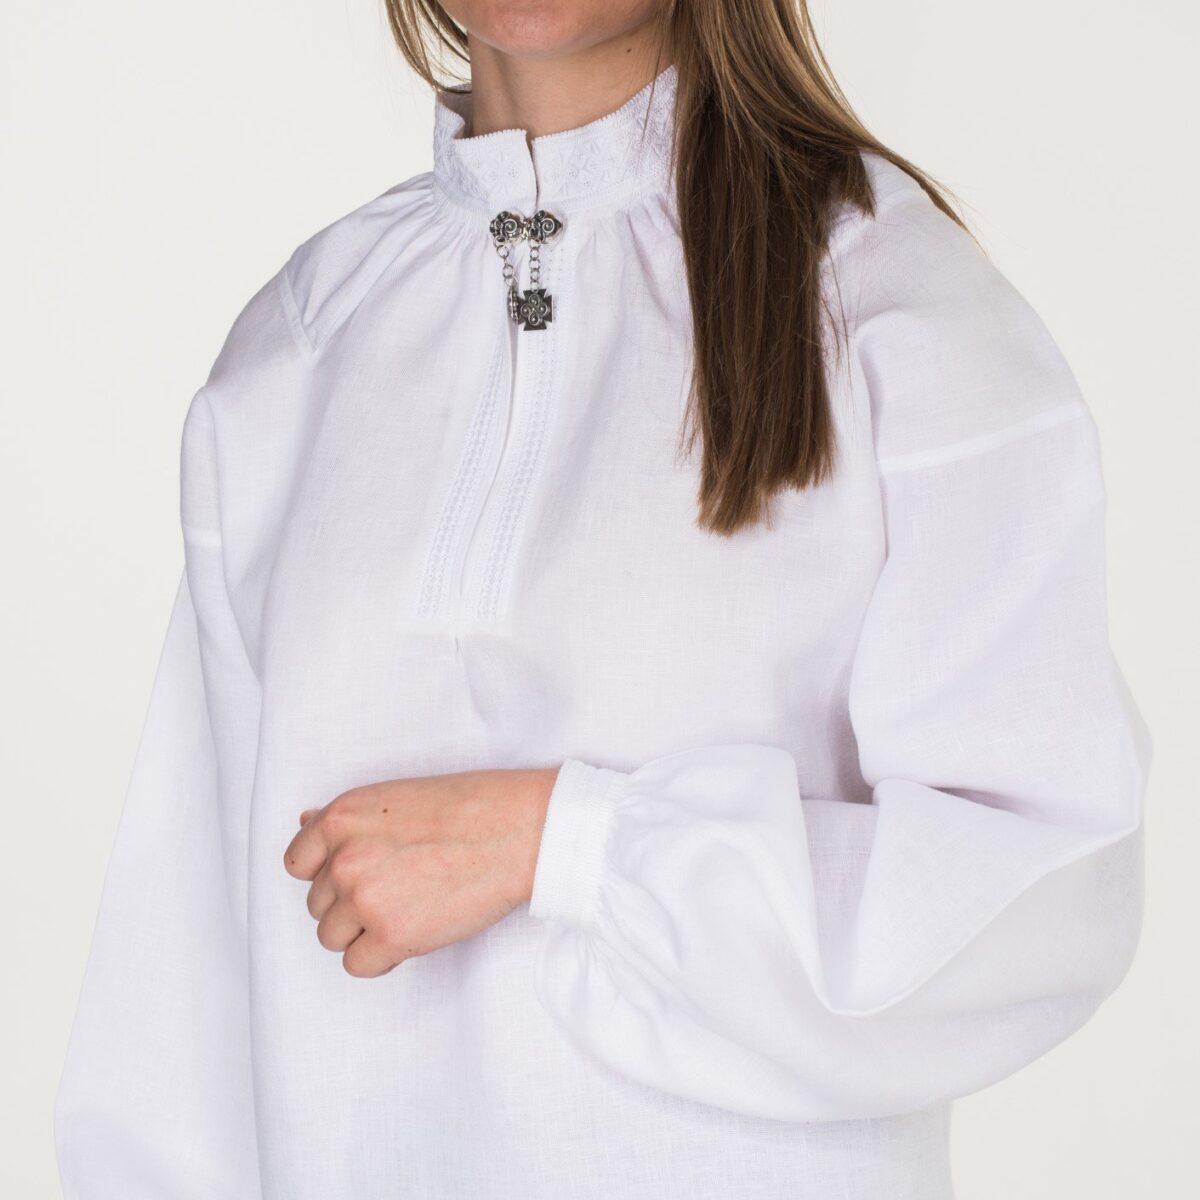 Suldal linskjorte-459